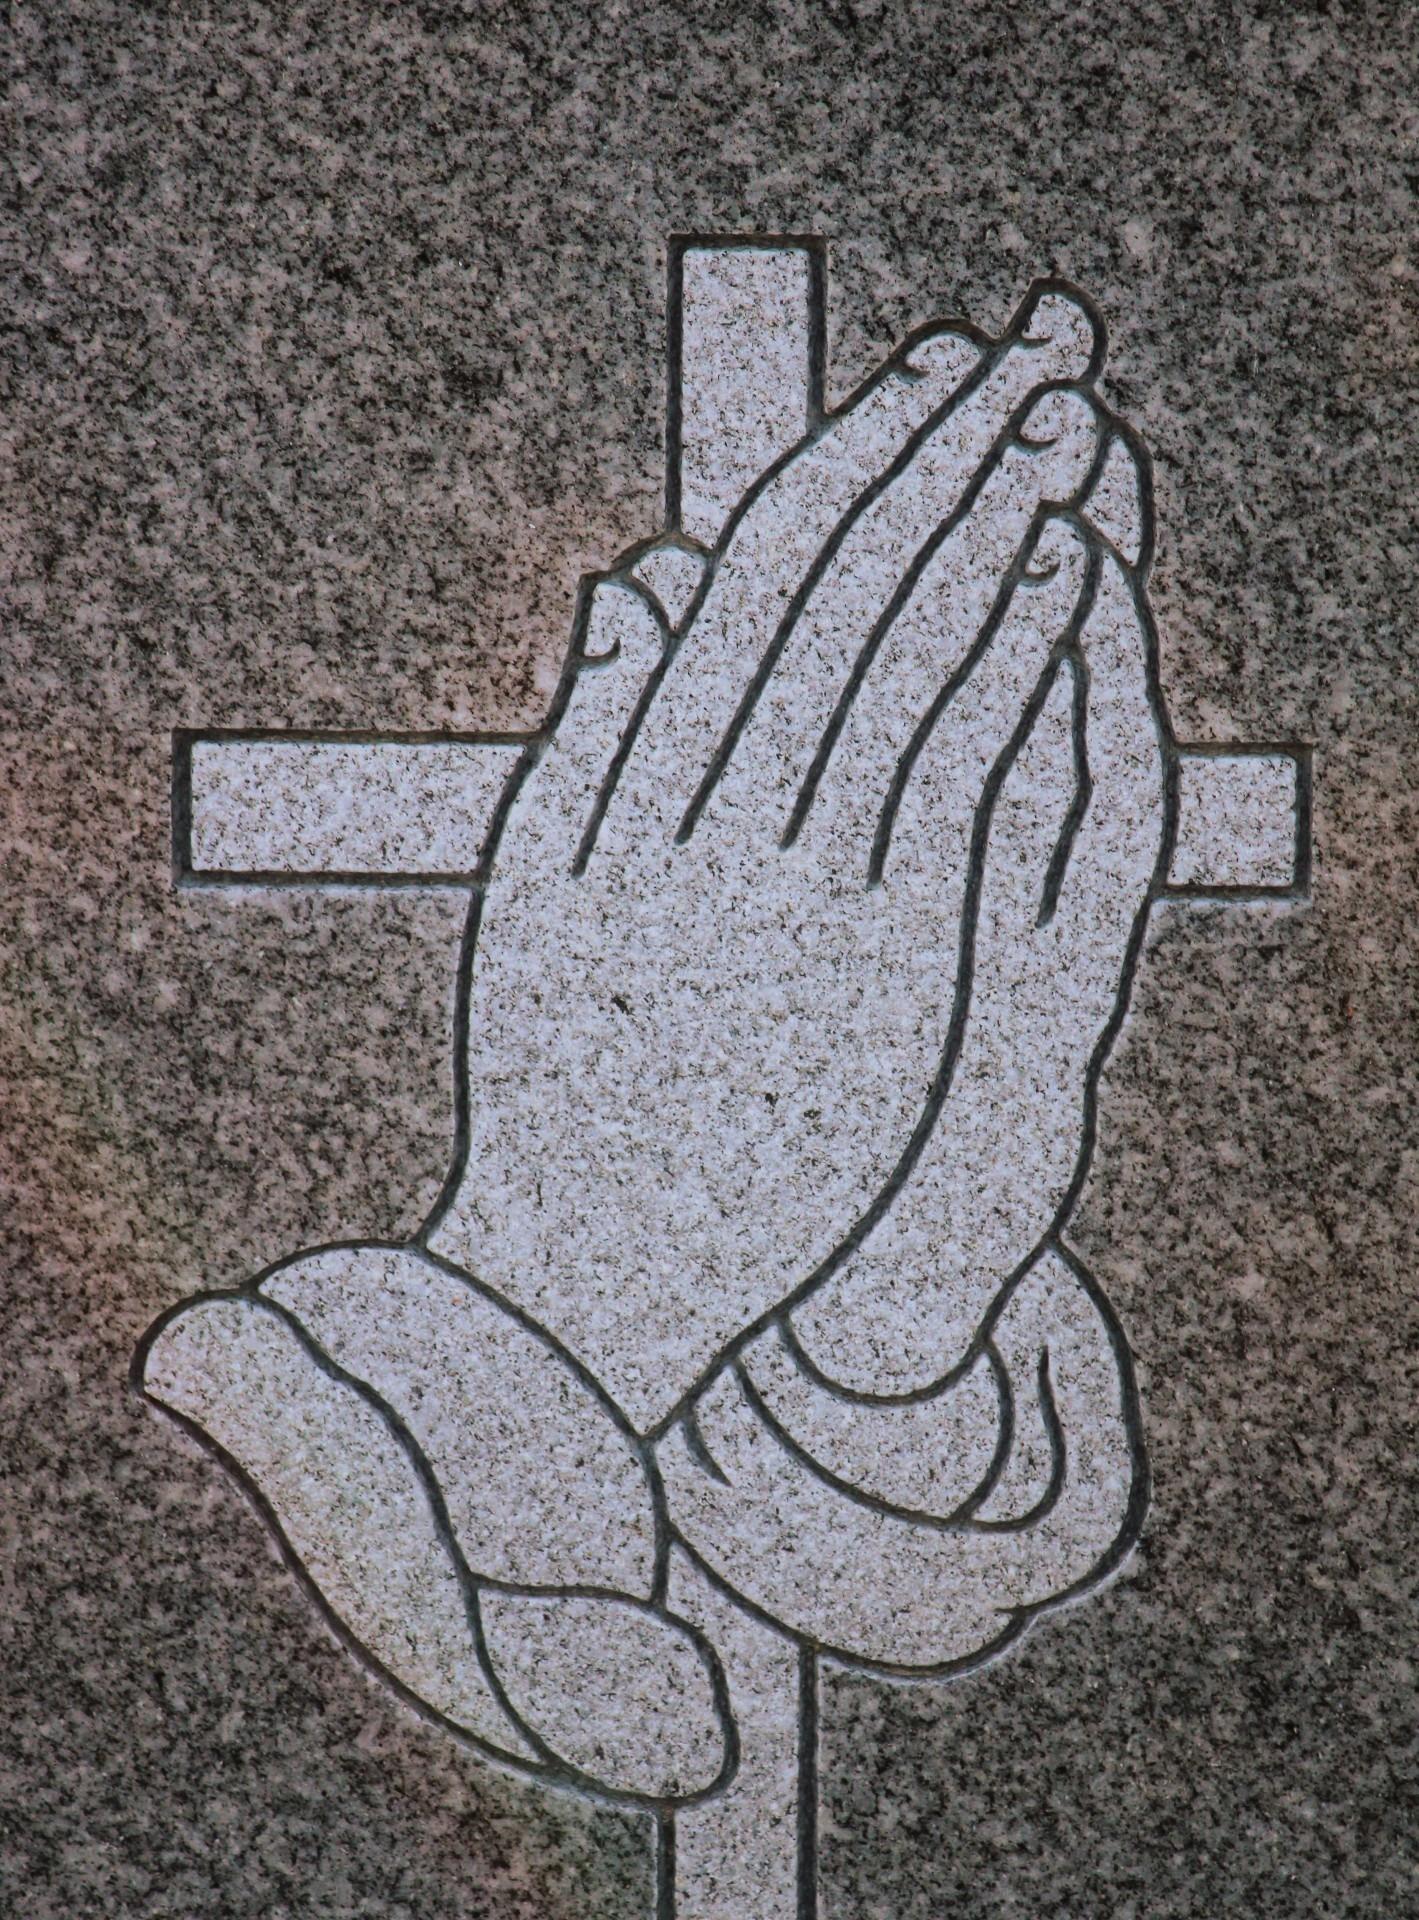 Gambar Jumlah Dinding Pola Garis Simbol Berdoa Fon Kuburan